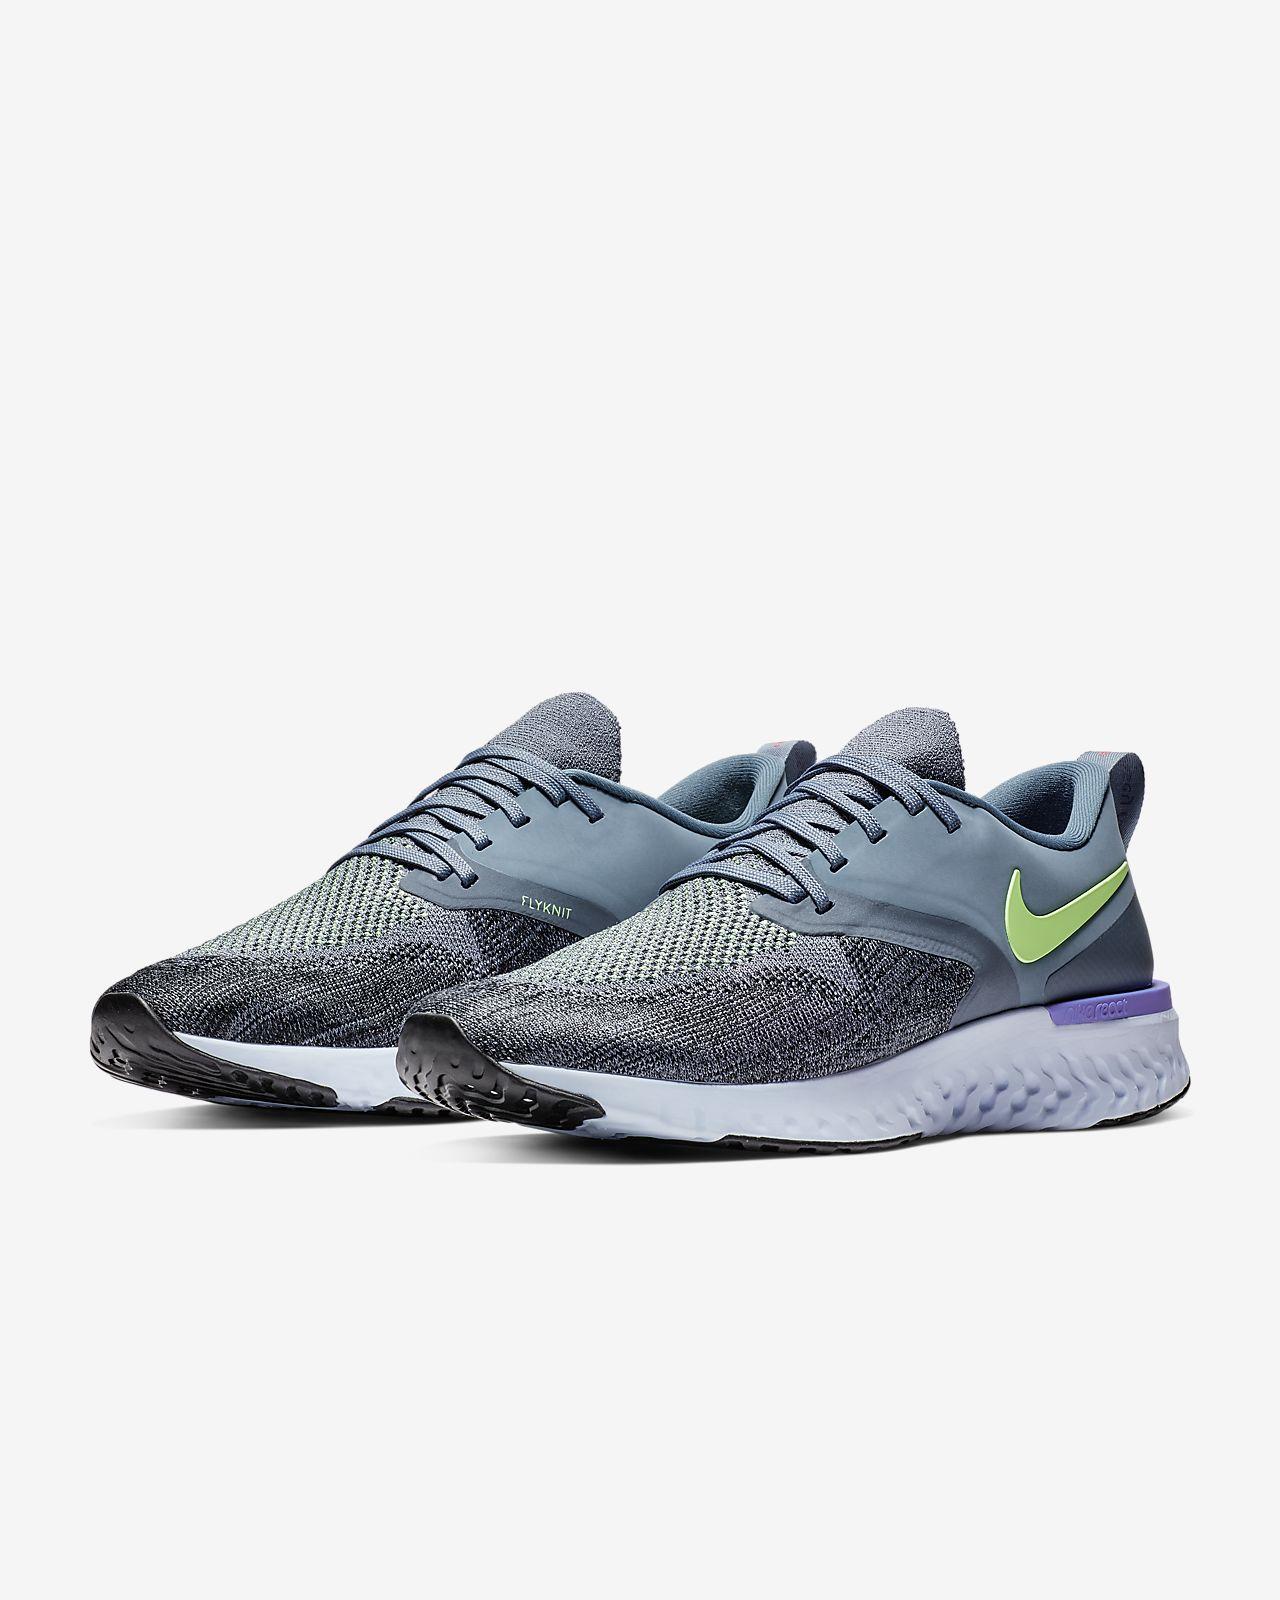 979efdaba6ae6 Nike Odyssey React Flyknit 2 Men's Running Shoe. Nike.com BE